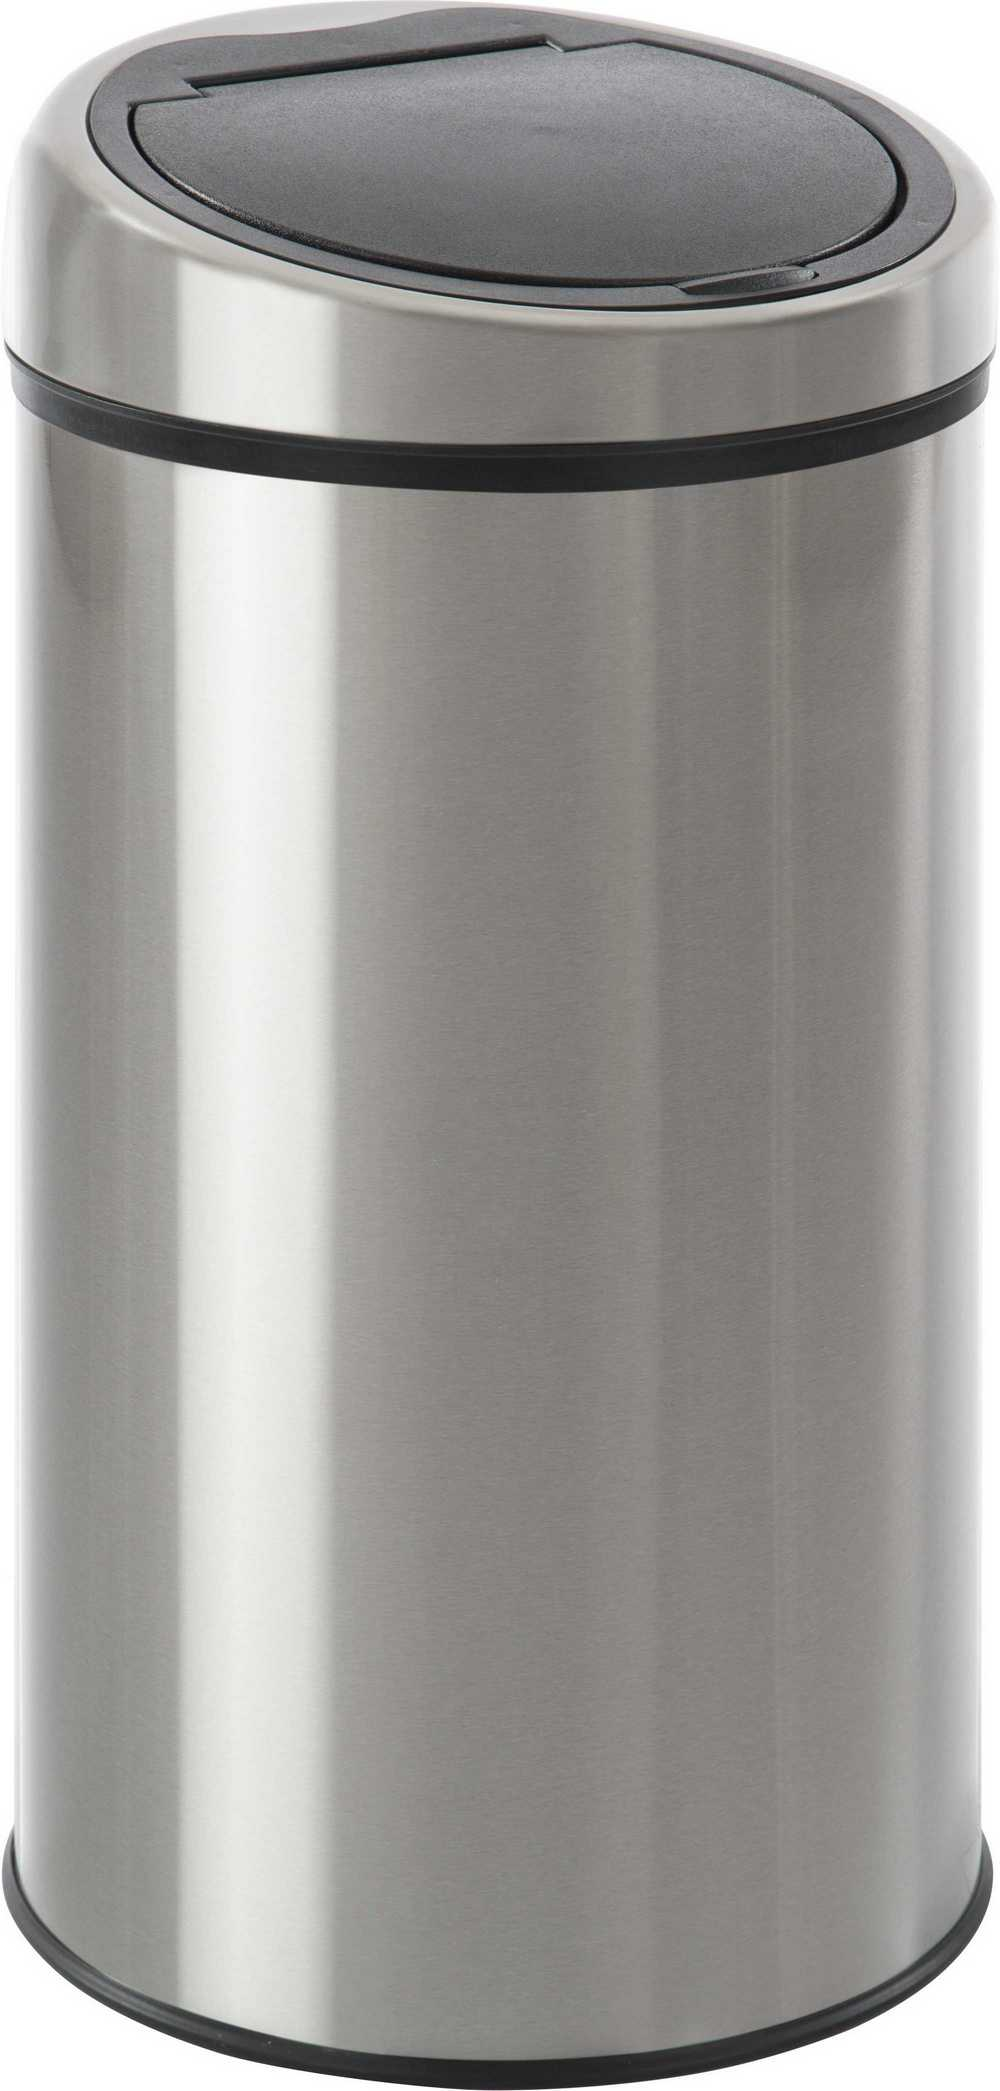 AFVALEMMER MAT INOX 40L PUSH BIN